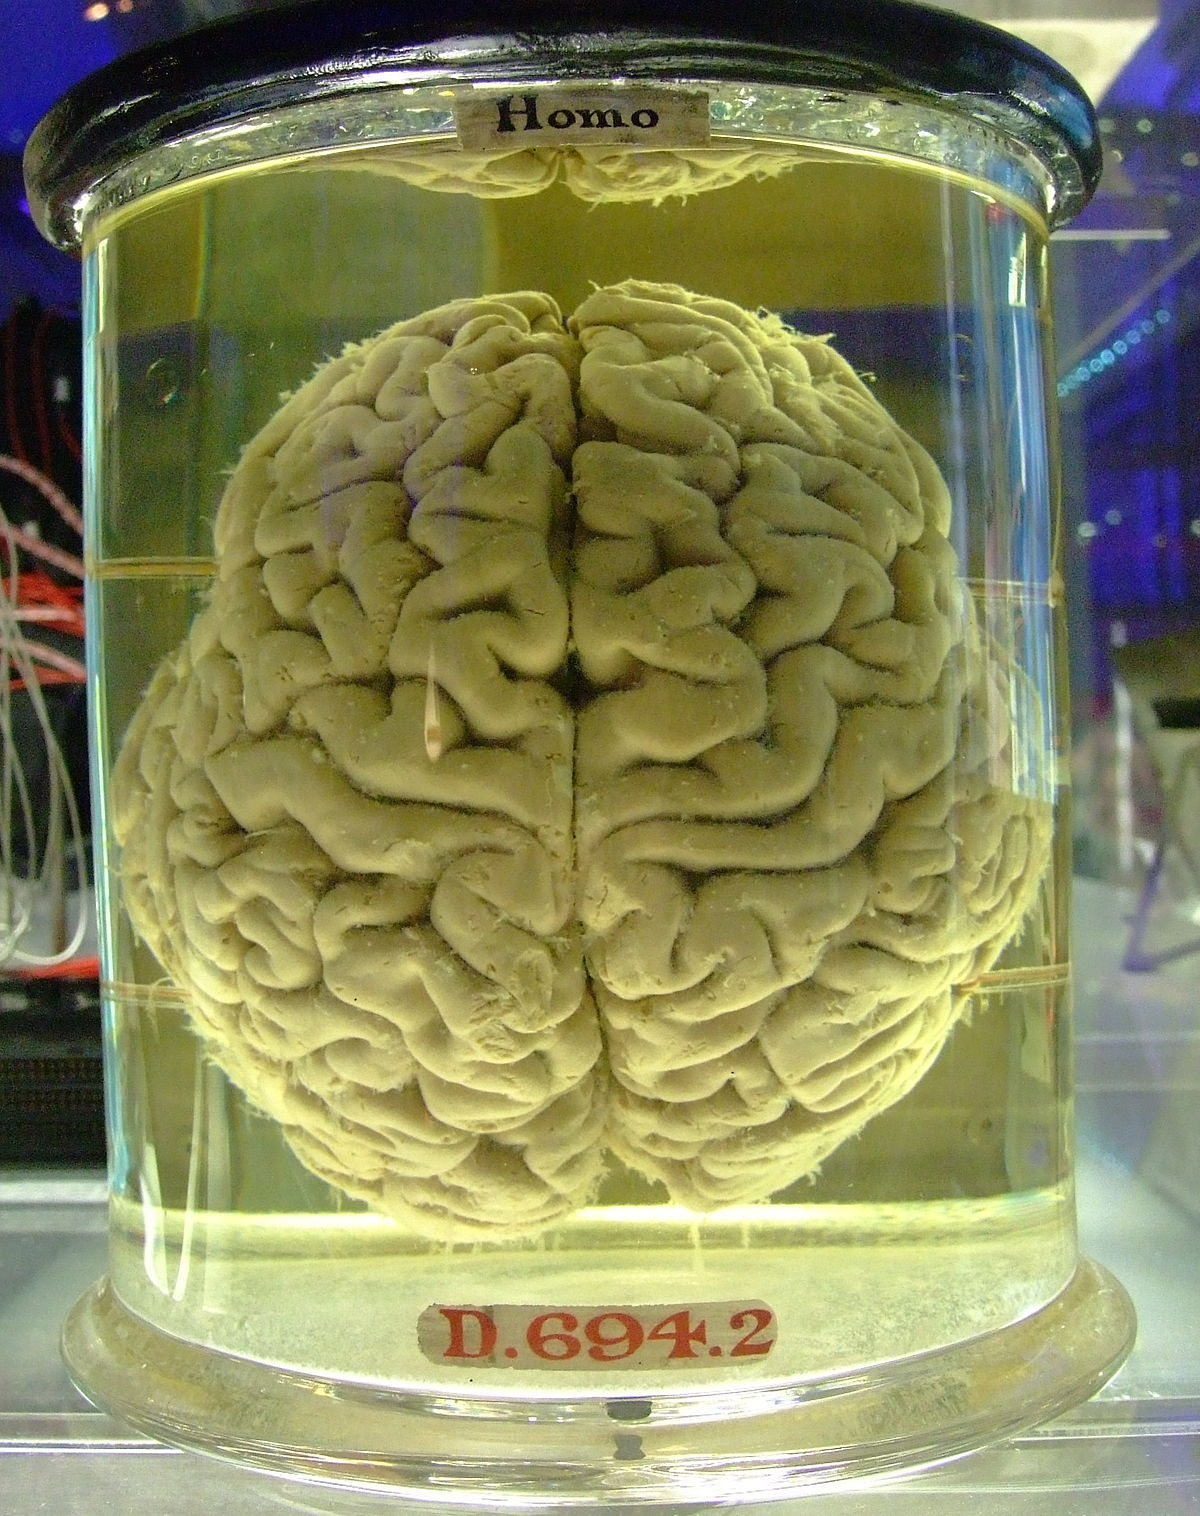 Cerebro - Wikipedia, la enciclopedia libre